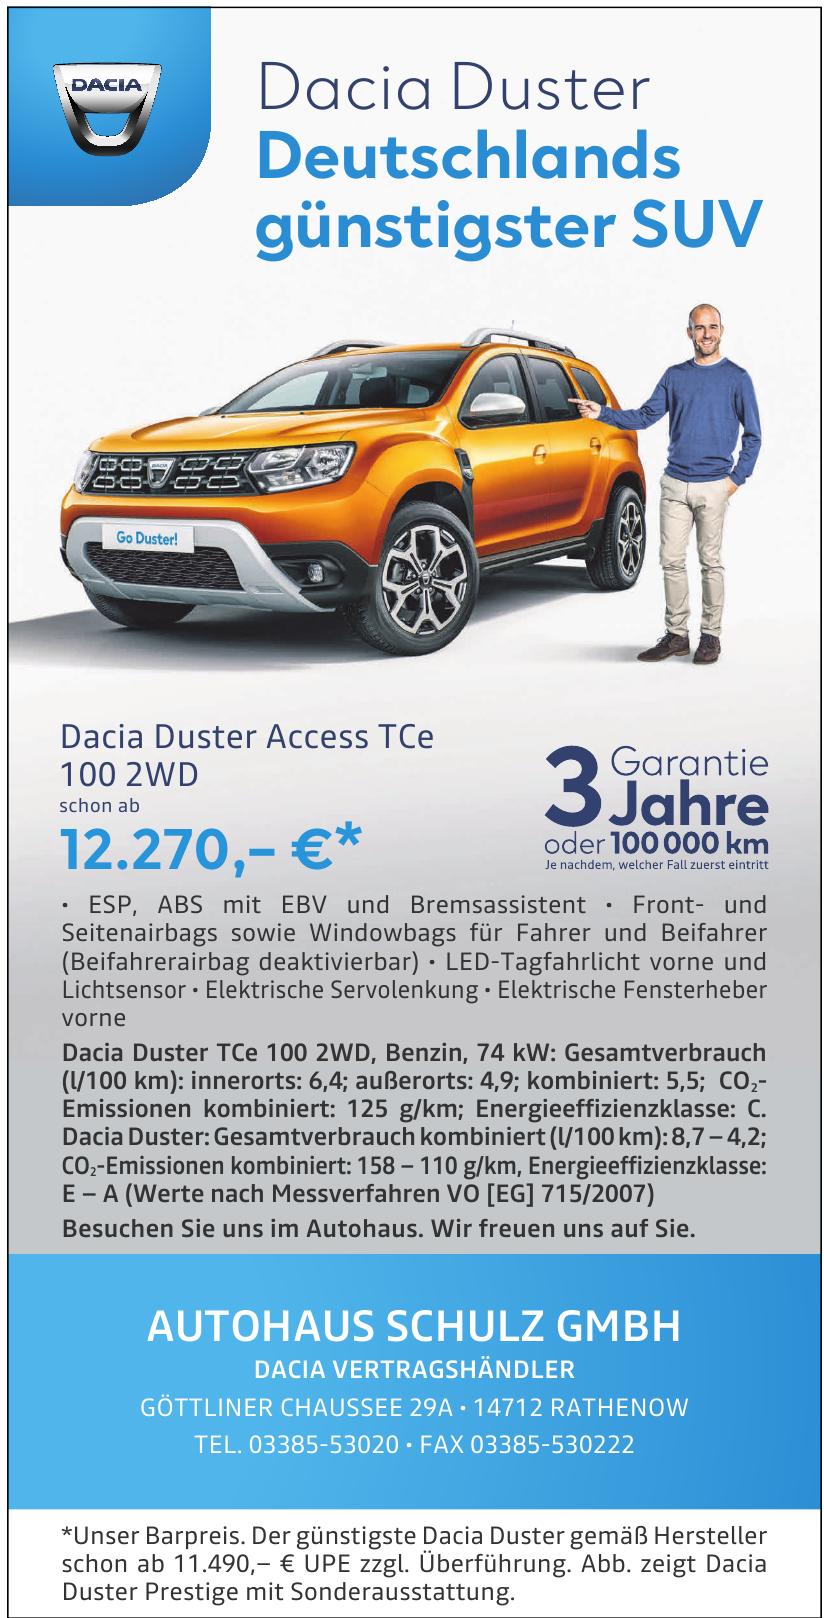 Autohaus Schulz GmbH